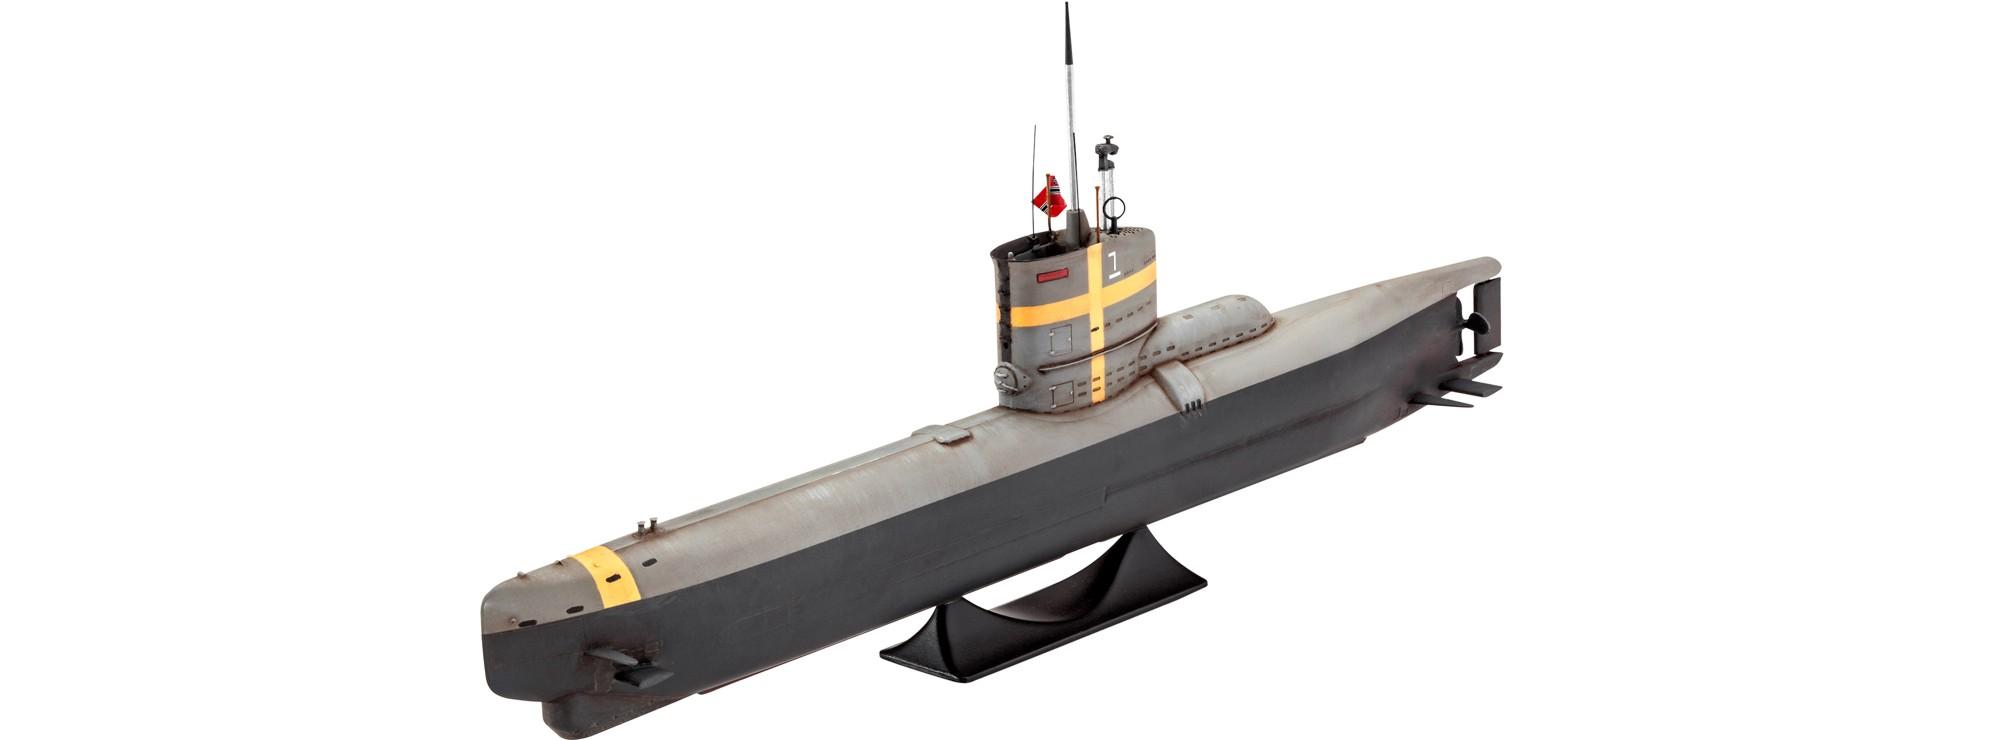 Type XXIII submarine